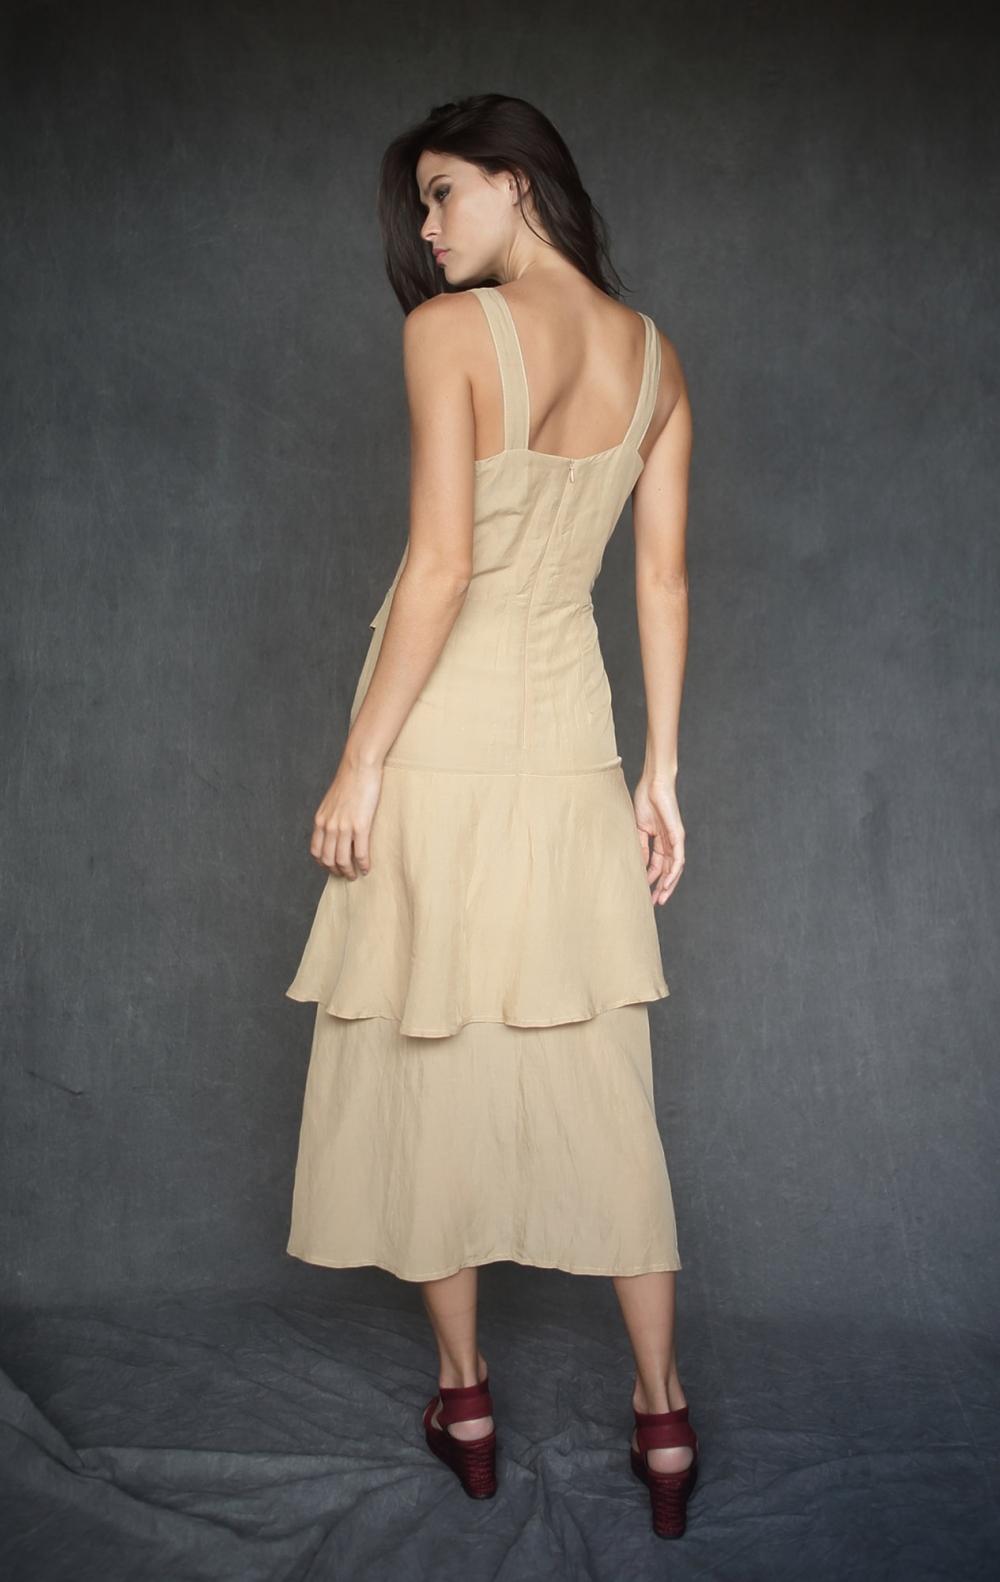 Vestido Cinto Fivela Bambu - Foto 2